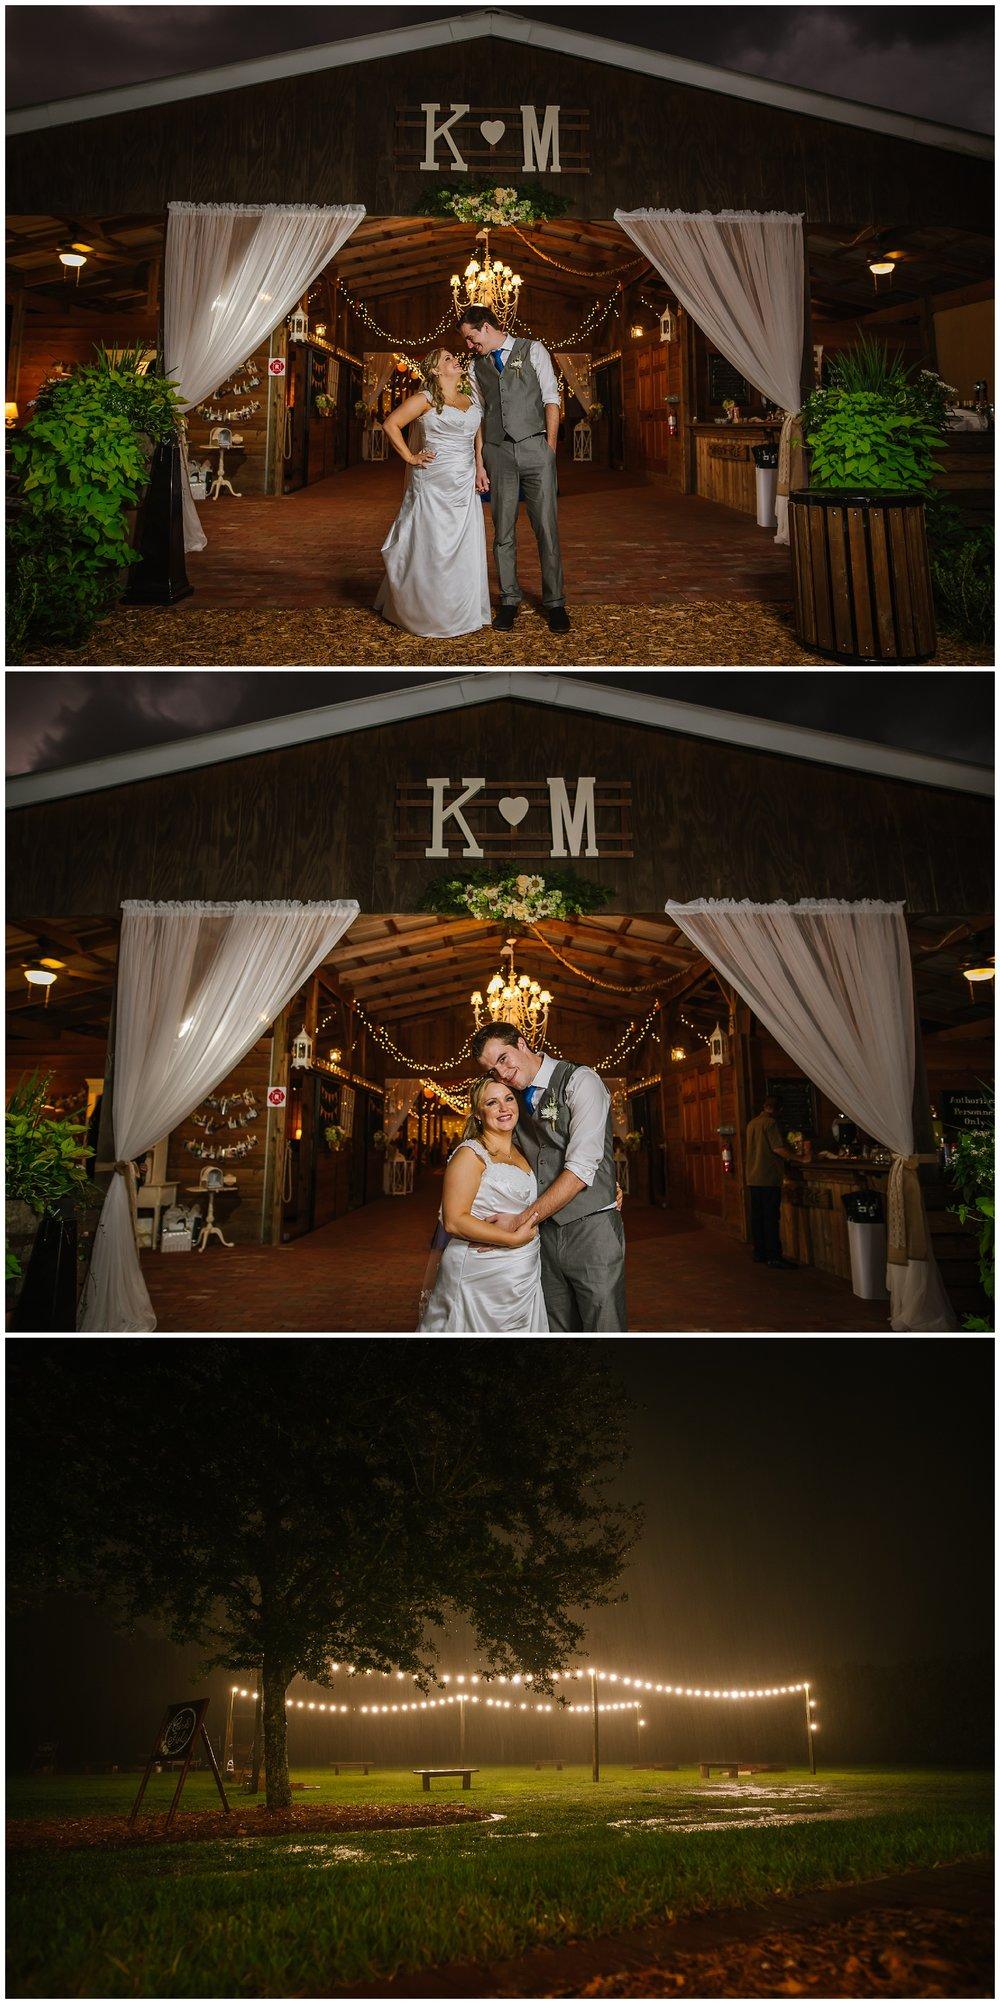 Cross-creek-ranch-navy-bush-tampa-wedding-photogrpaher_0060.jpg